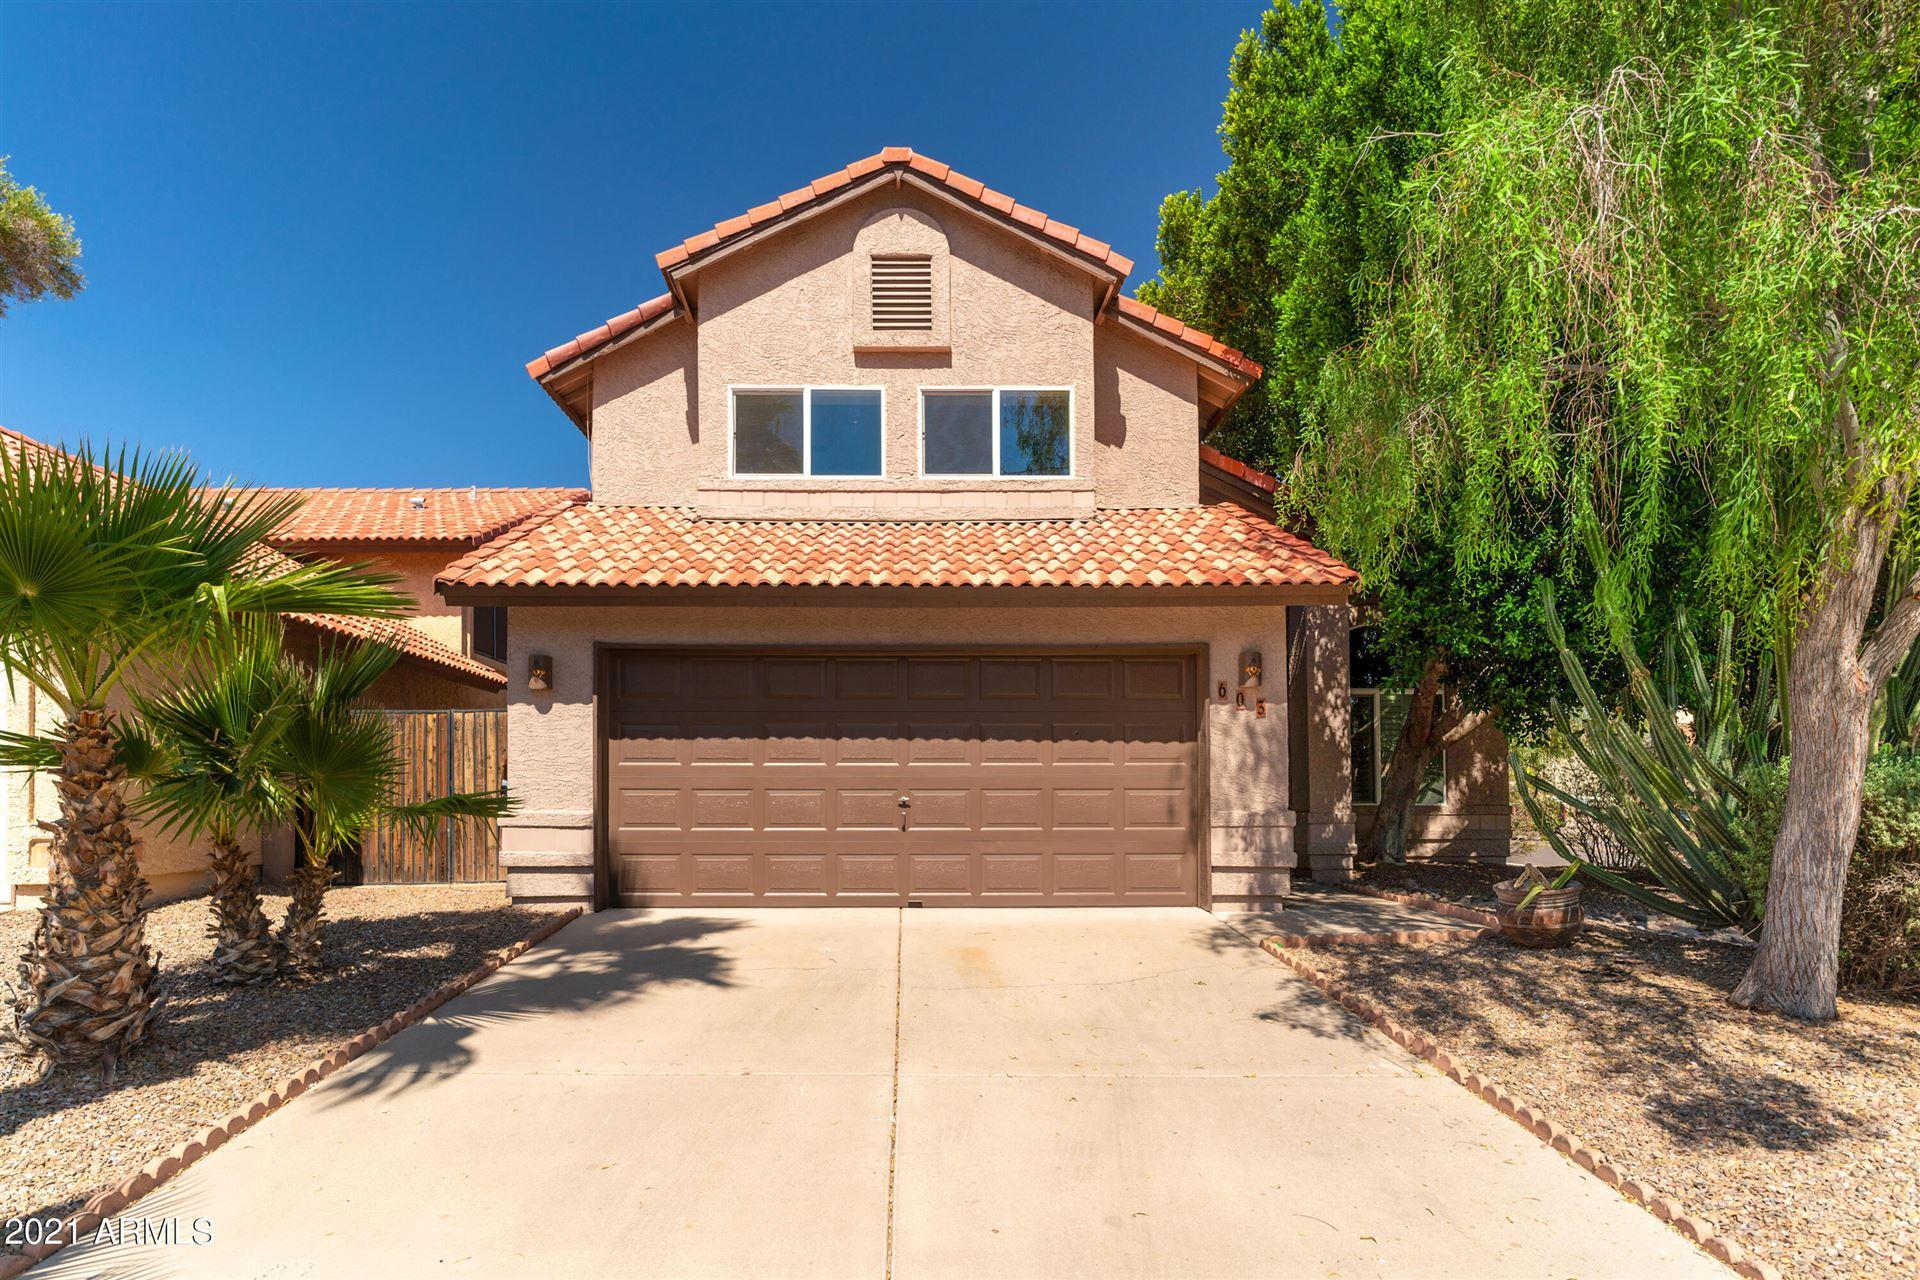 603 N ELM Street, Chandler, AZ 85226 - MLS#: 6230336